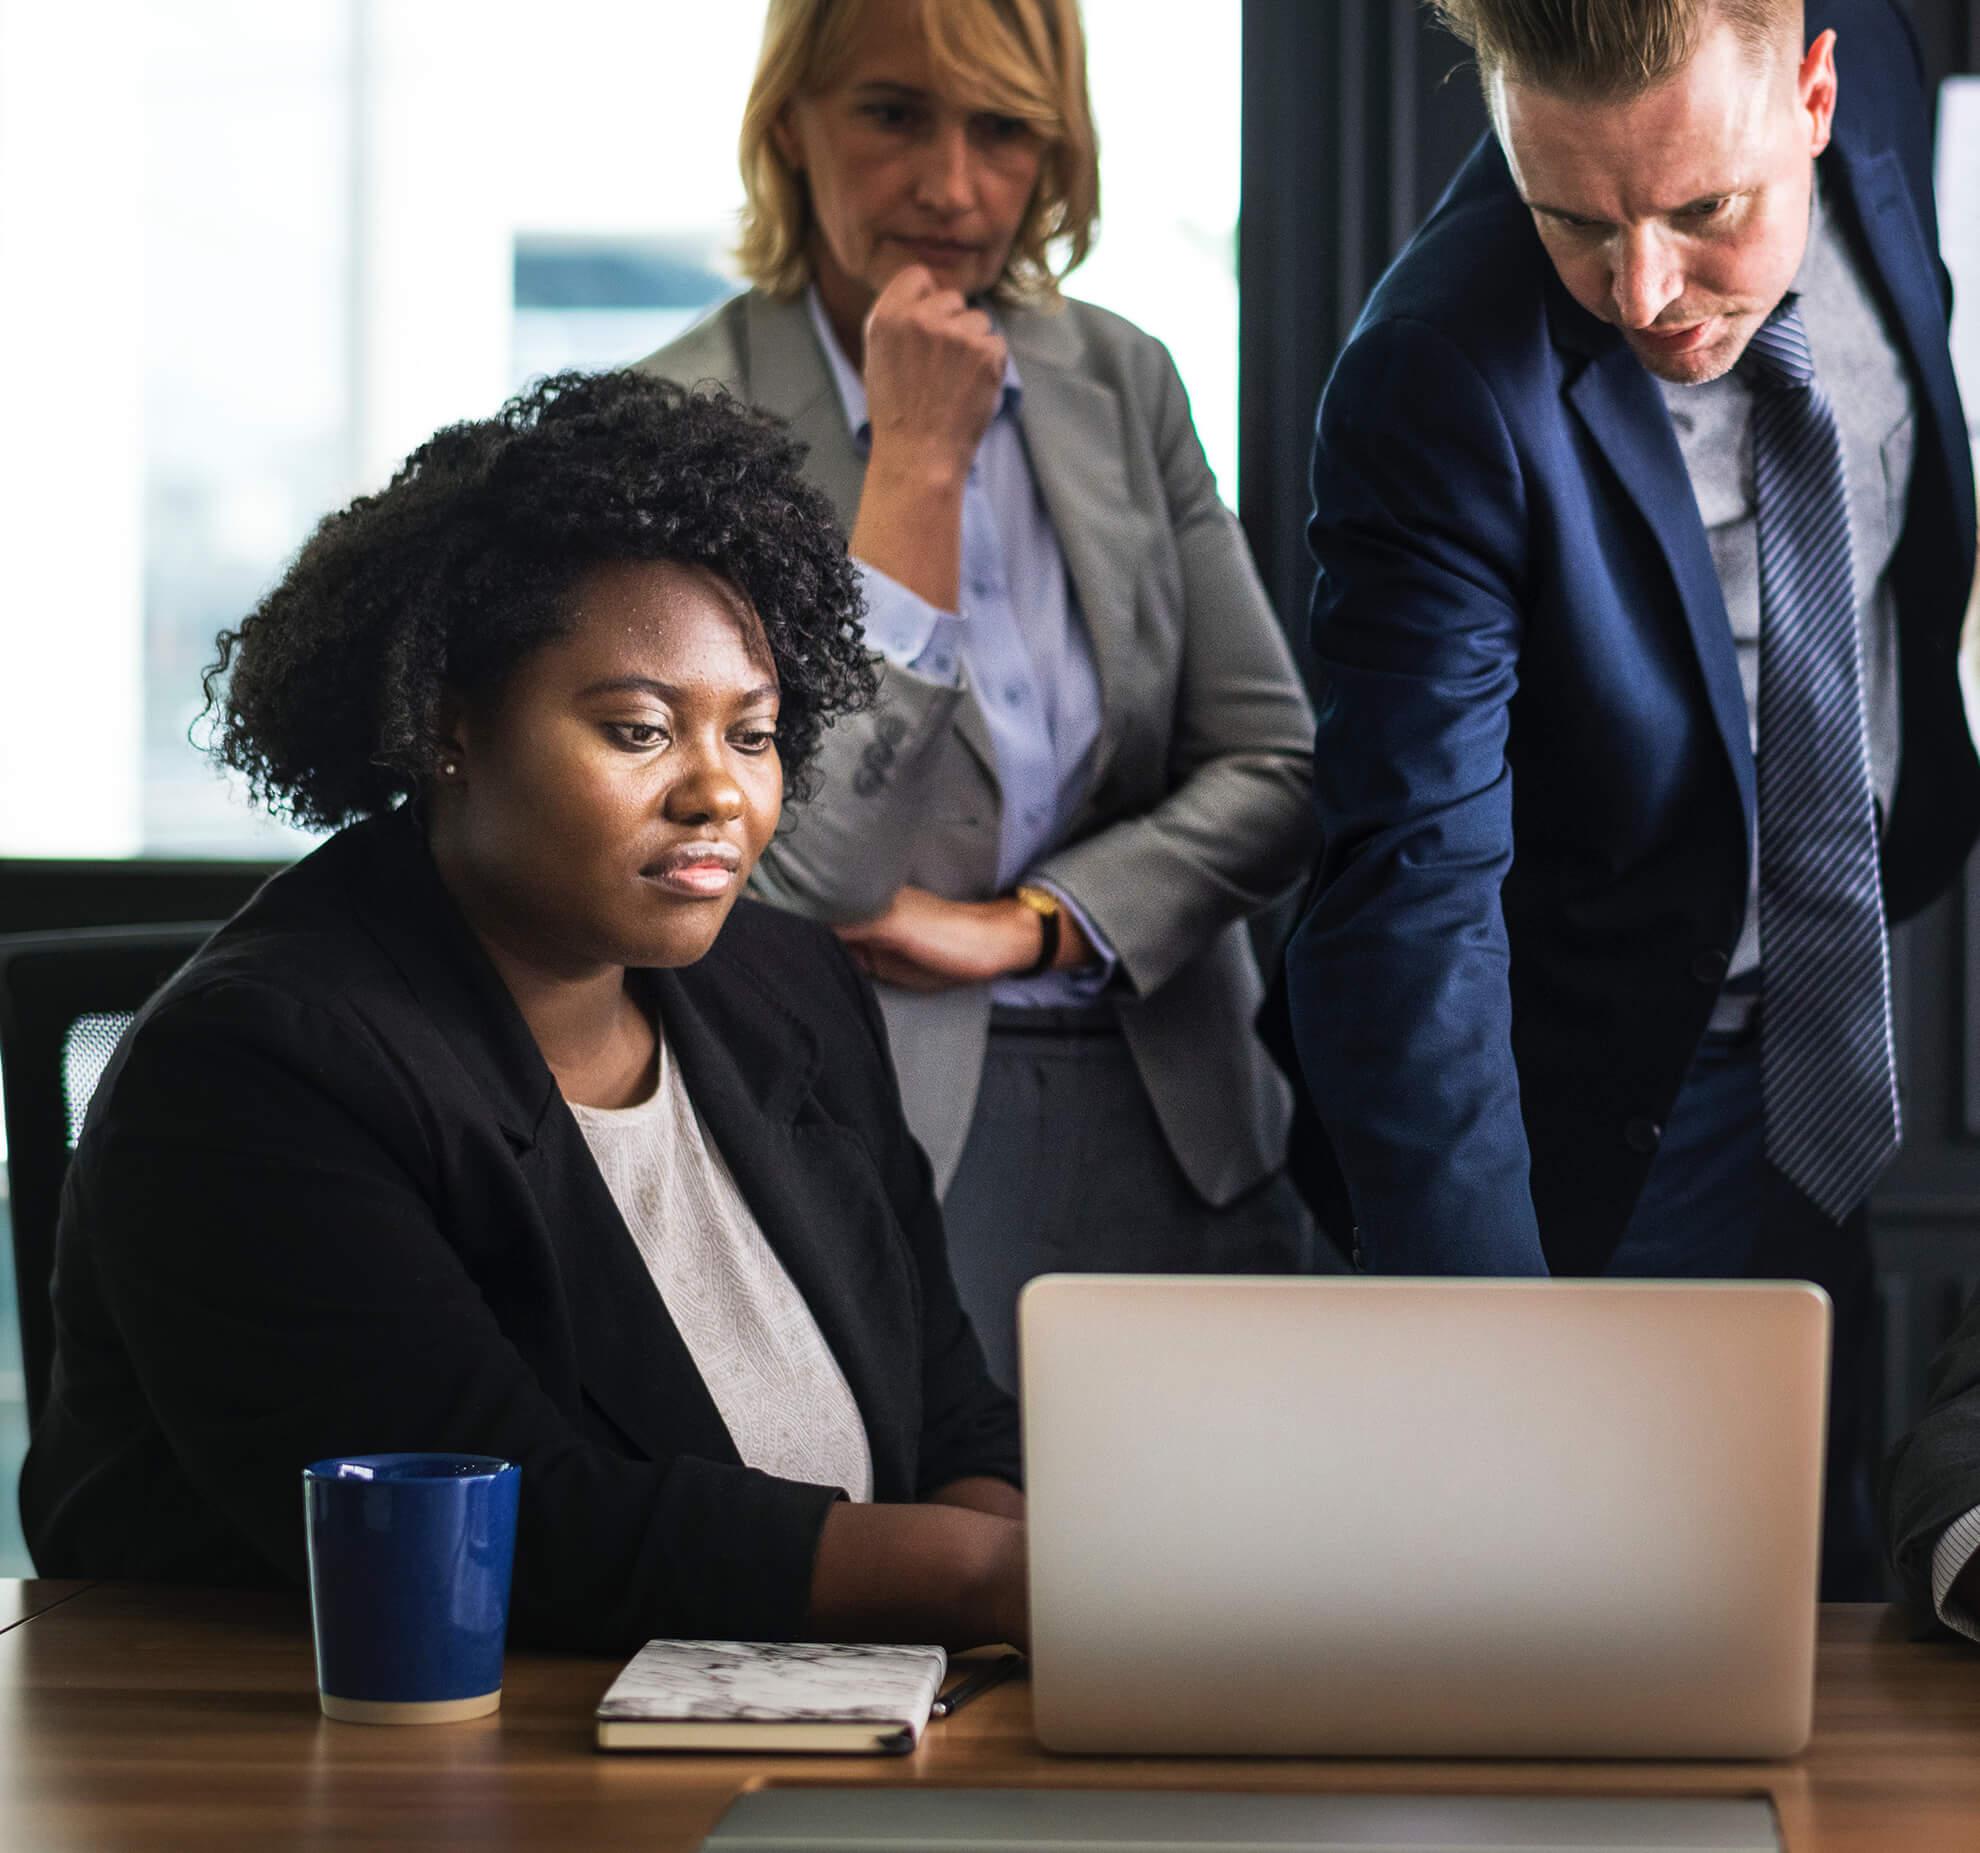 three business professionals gathered around a laptop